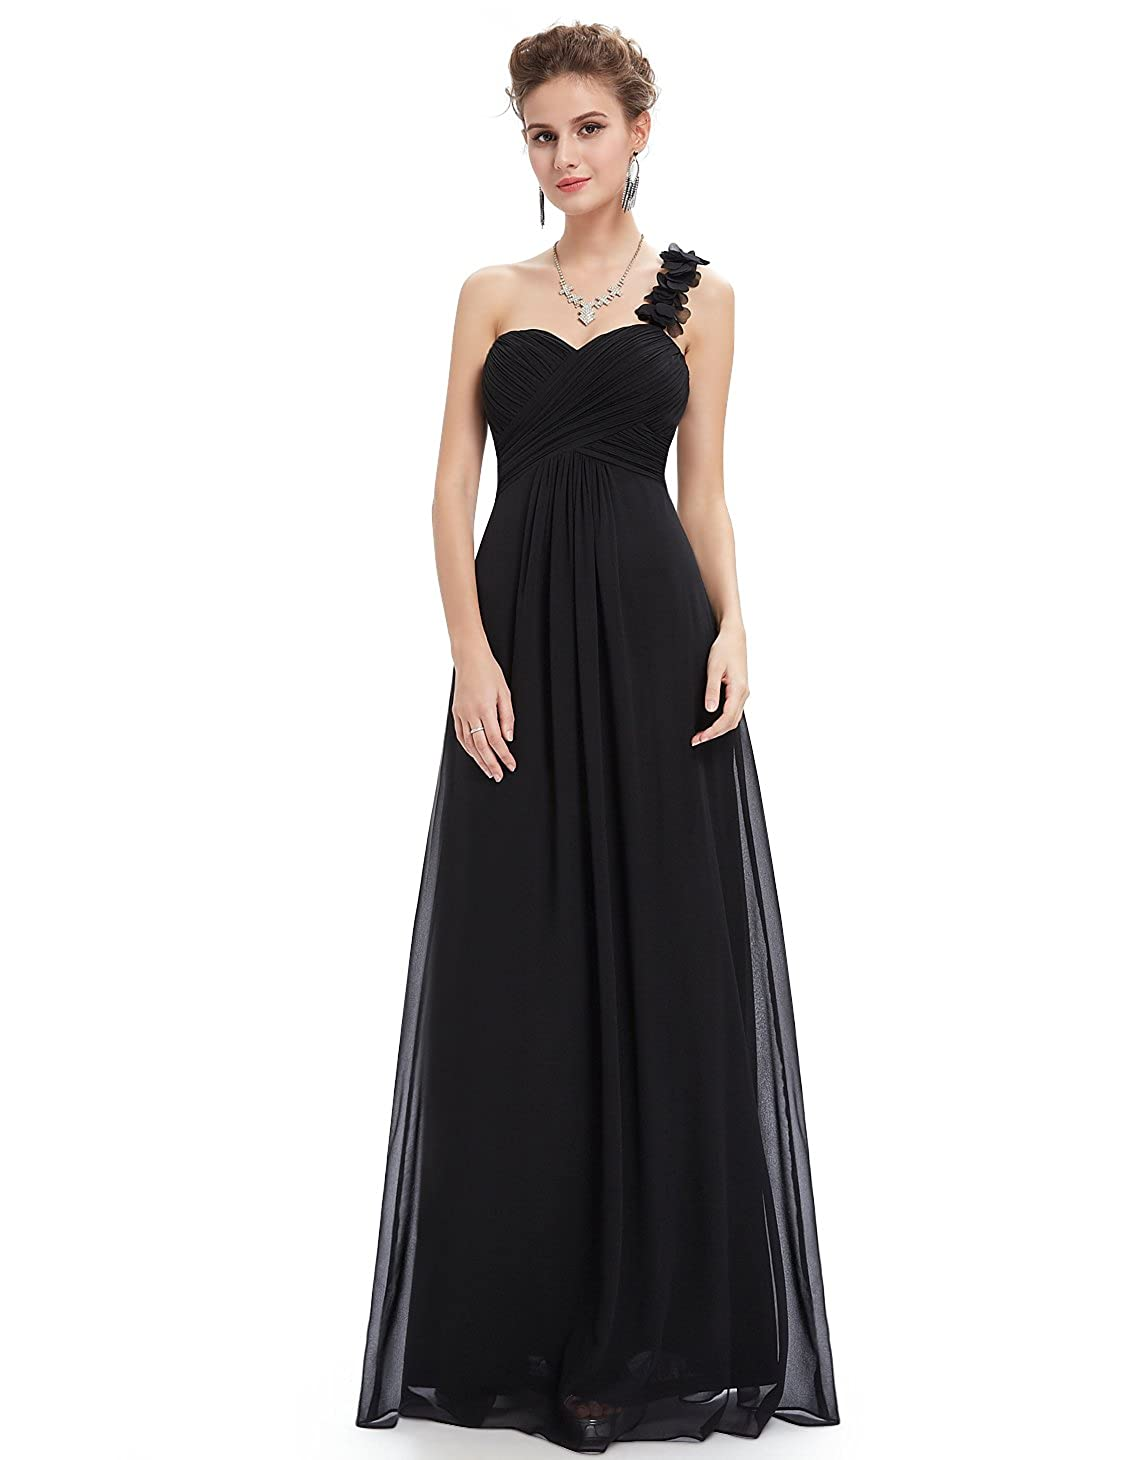 Ever-Pretty Flower One Shoulder Empire Waist Floor Length Bridesmaids Dress  09768 at Amazon Women s Clothing store  63963b136bbc